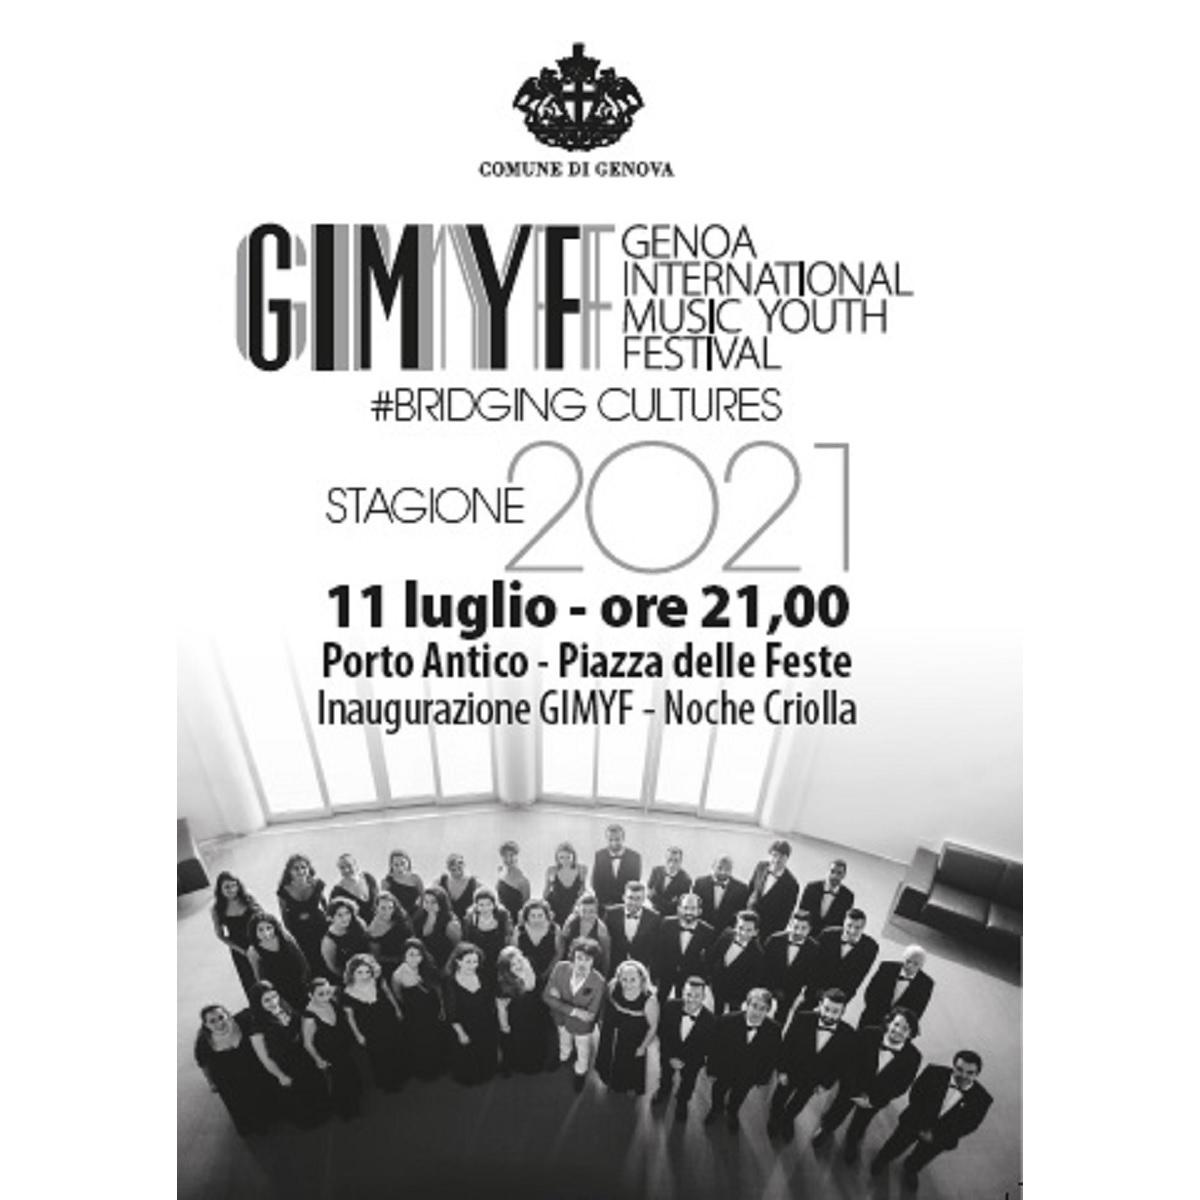 Genoa International Music Youth Festival foto